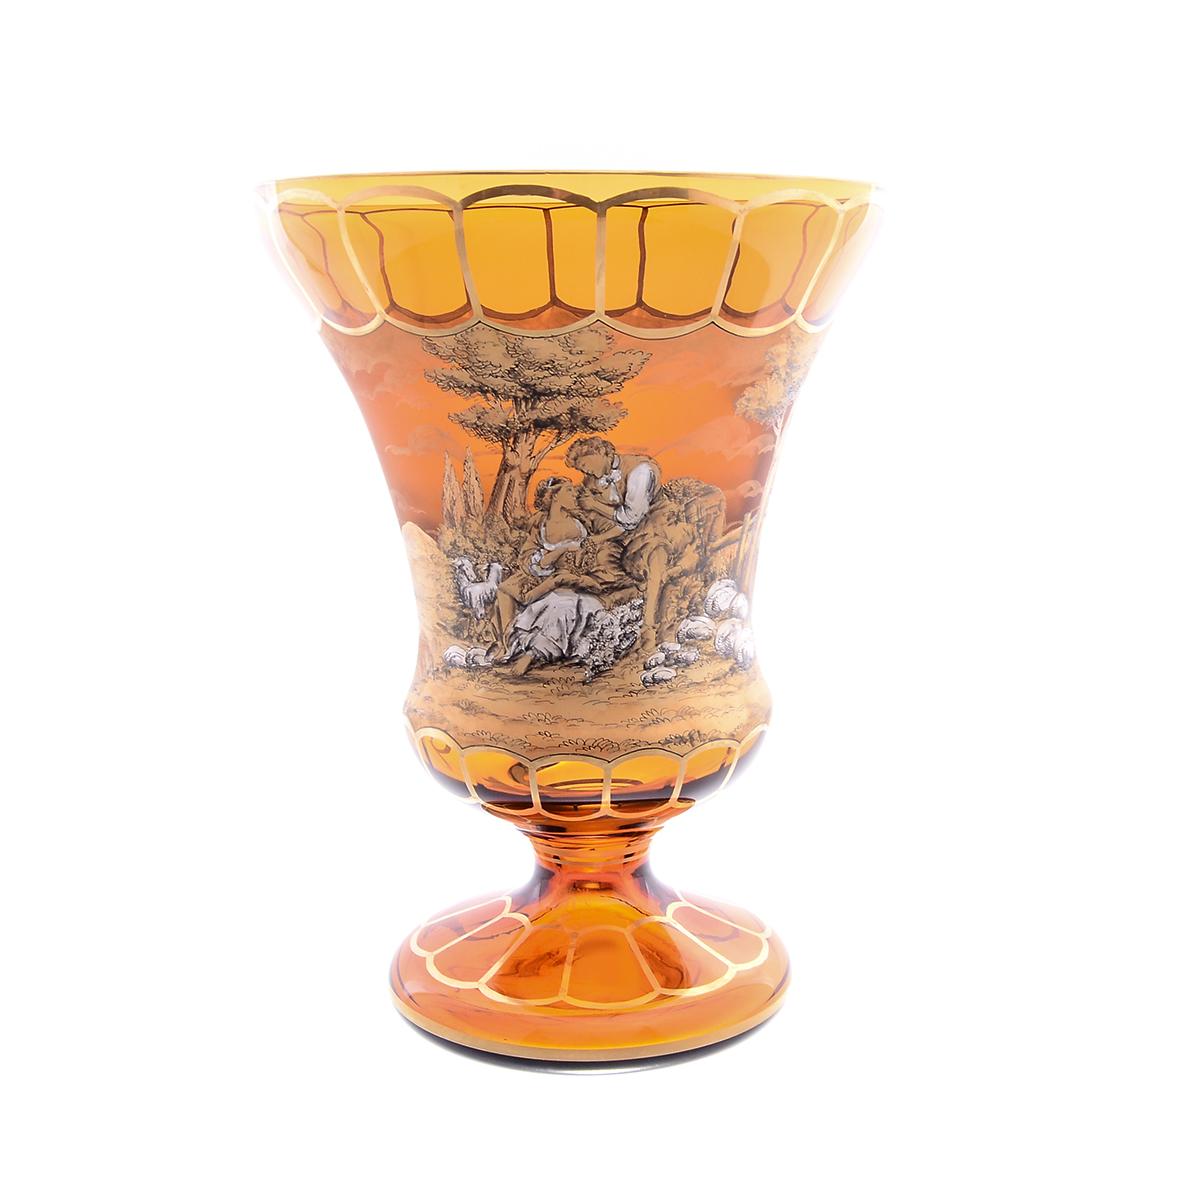 Ваза 31 см для цветов из стекла янтарного цвета от Egermann